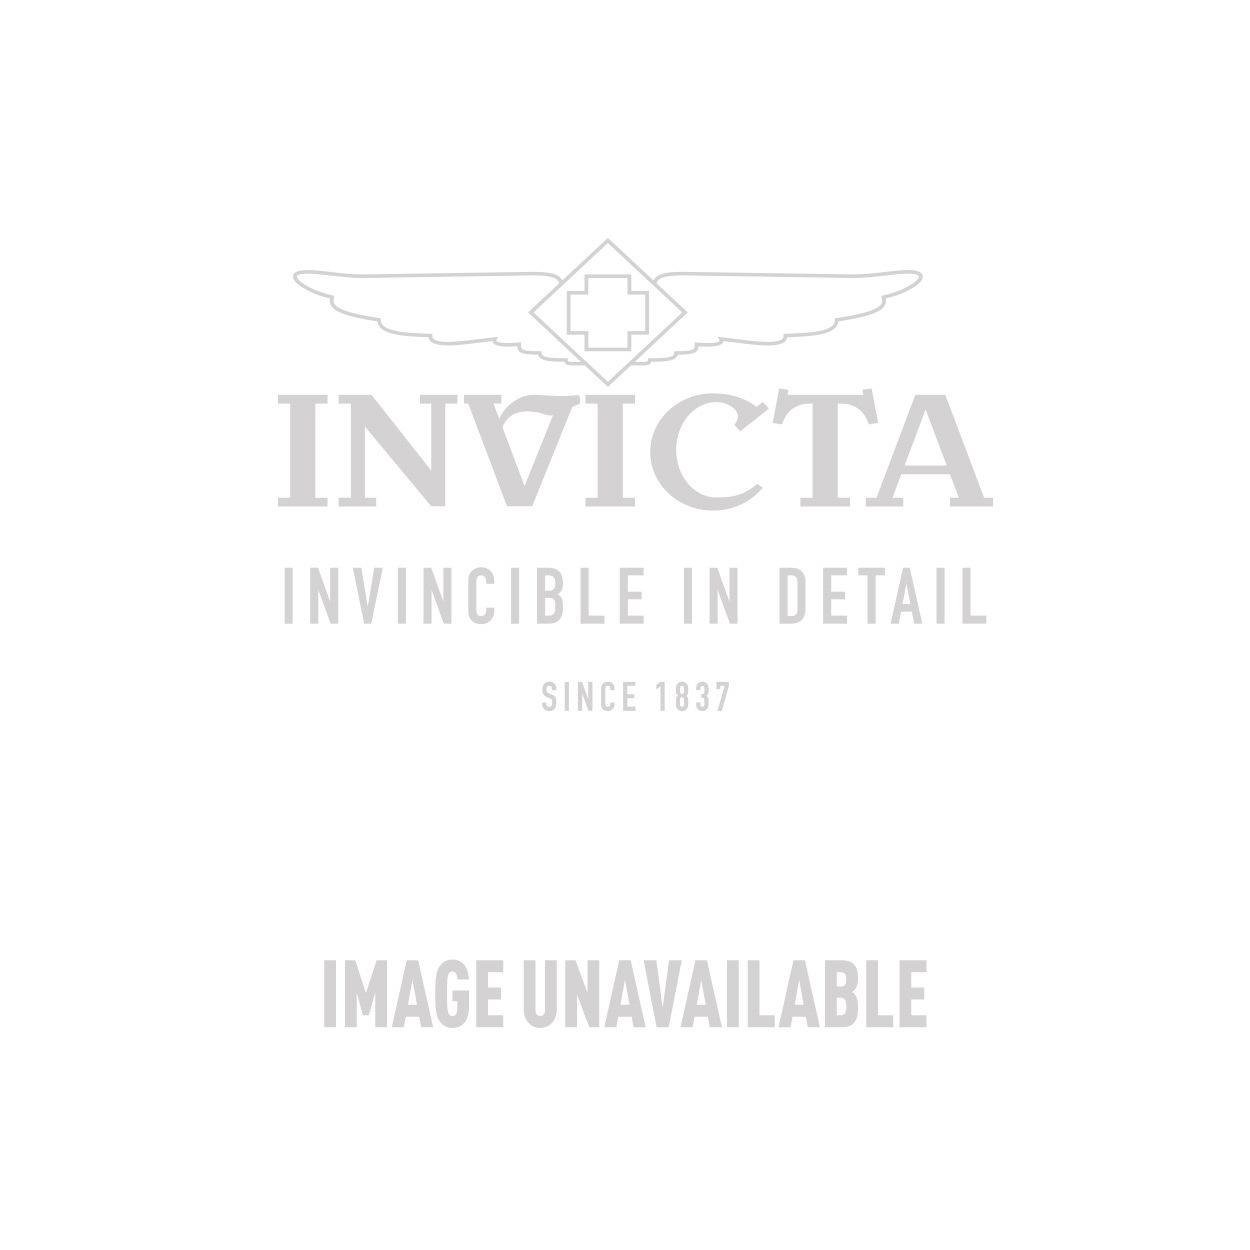 Invicta Sea Hunter  Quartz Watch - Gunmetal case with Grey tone Polyurethane band - Model 1989